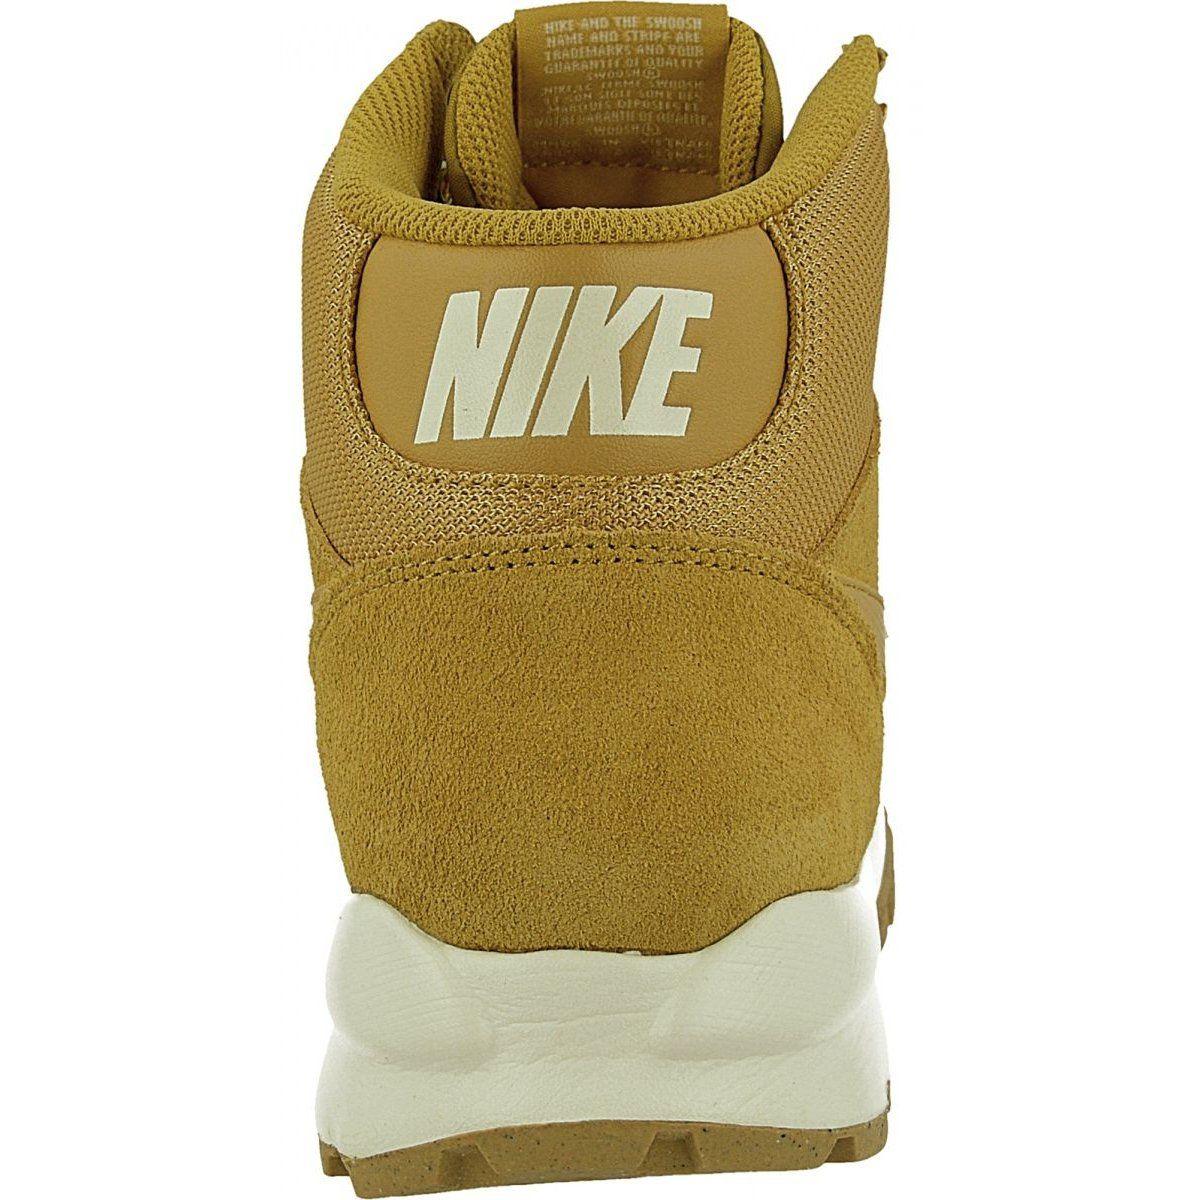 Buty Zimowe Nike Hoodland Suede M 654888 727 Brazowe Wielokolorowe Winter Boots Mens Nike Shoes Nike